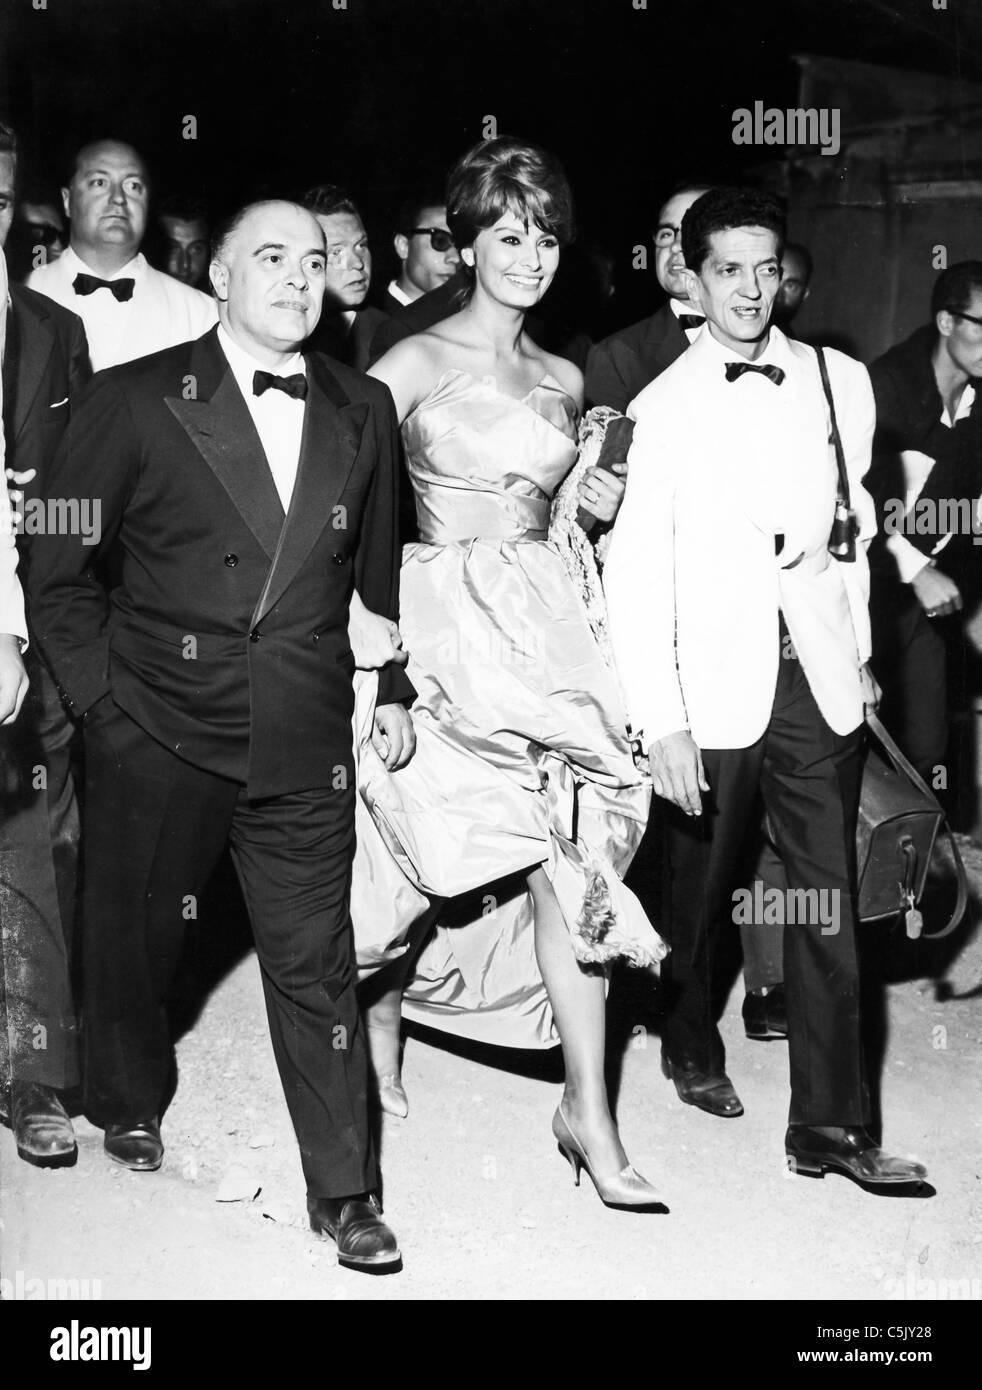 carlo ponti with sophia loren, 1960 Stock Photo - Alamy